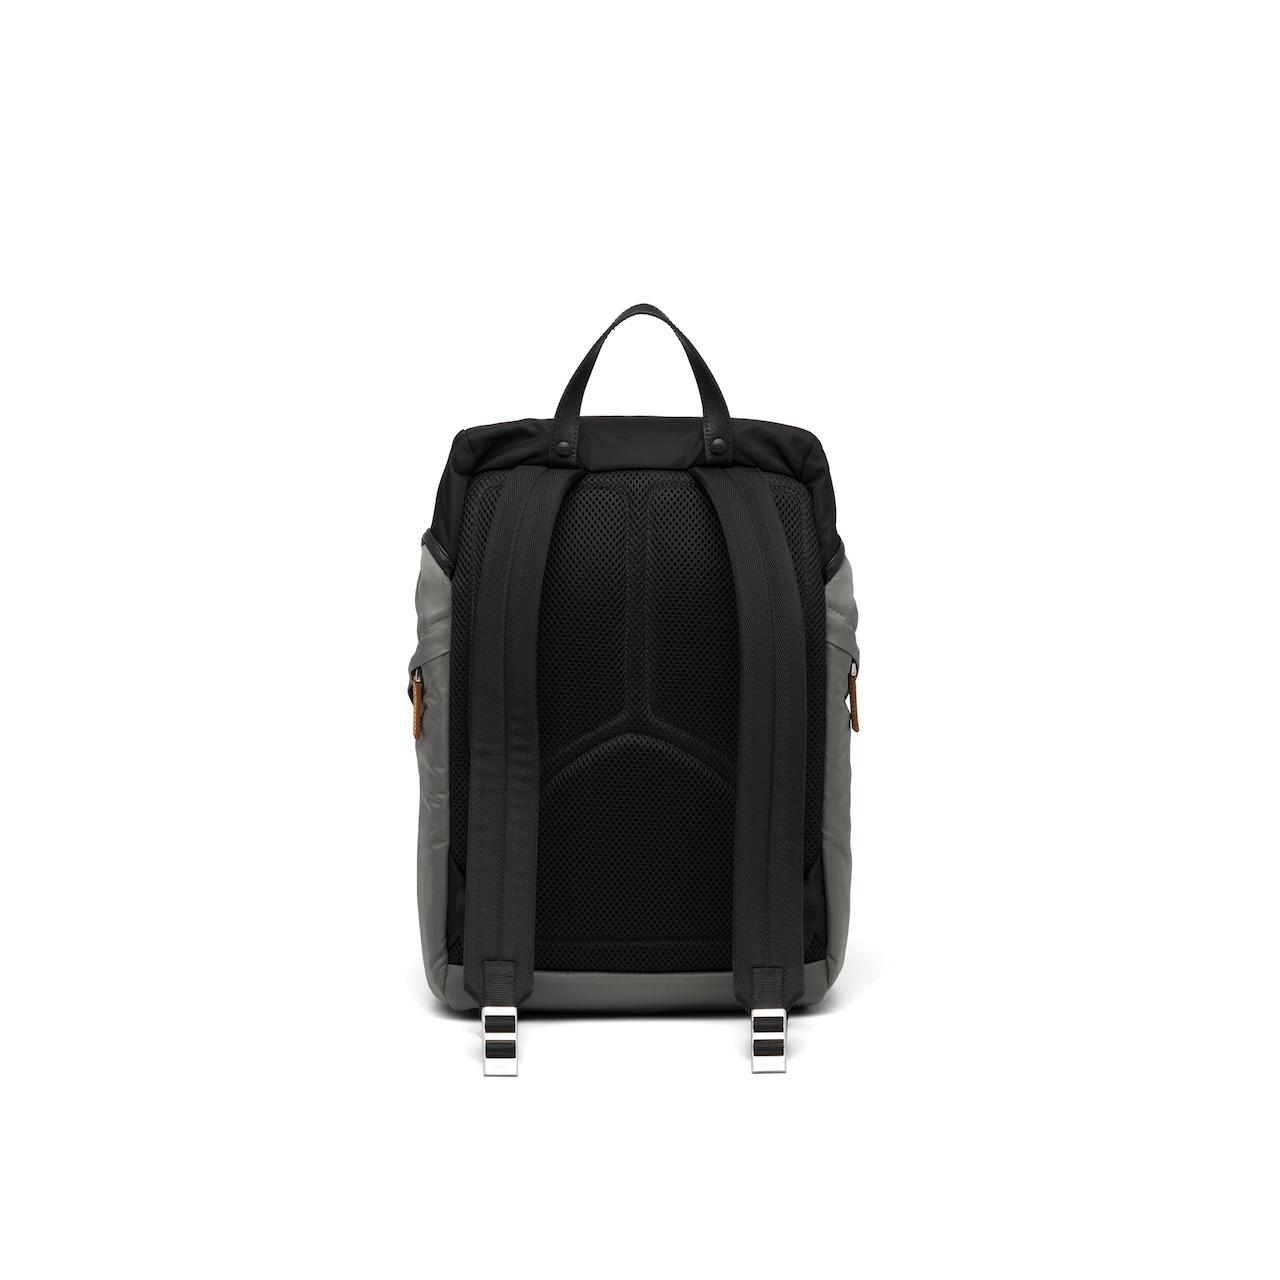 Prada Nylon and Saffiano leather backpack 4